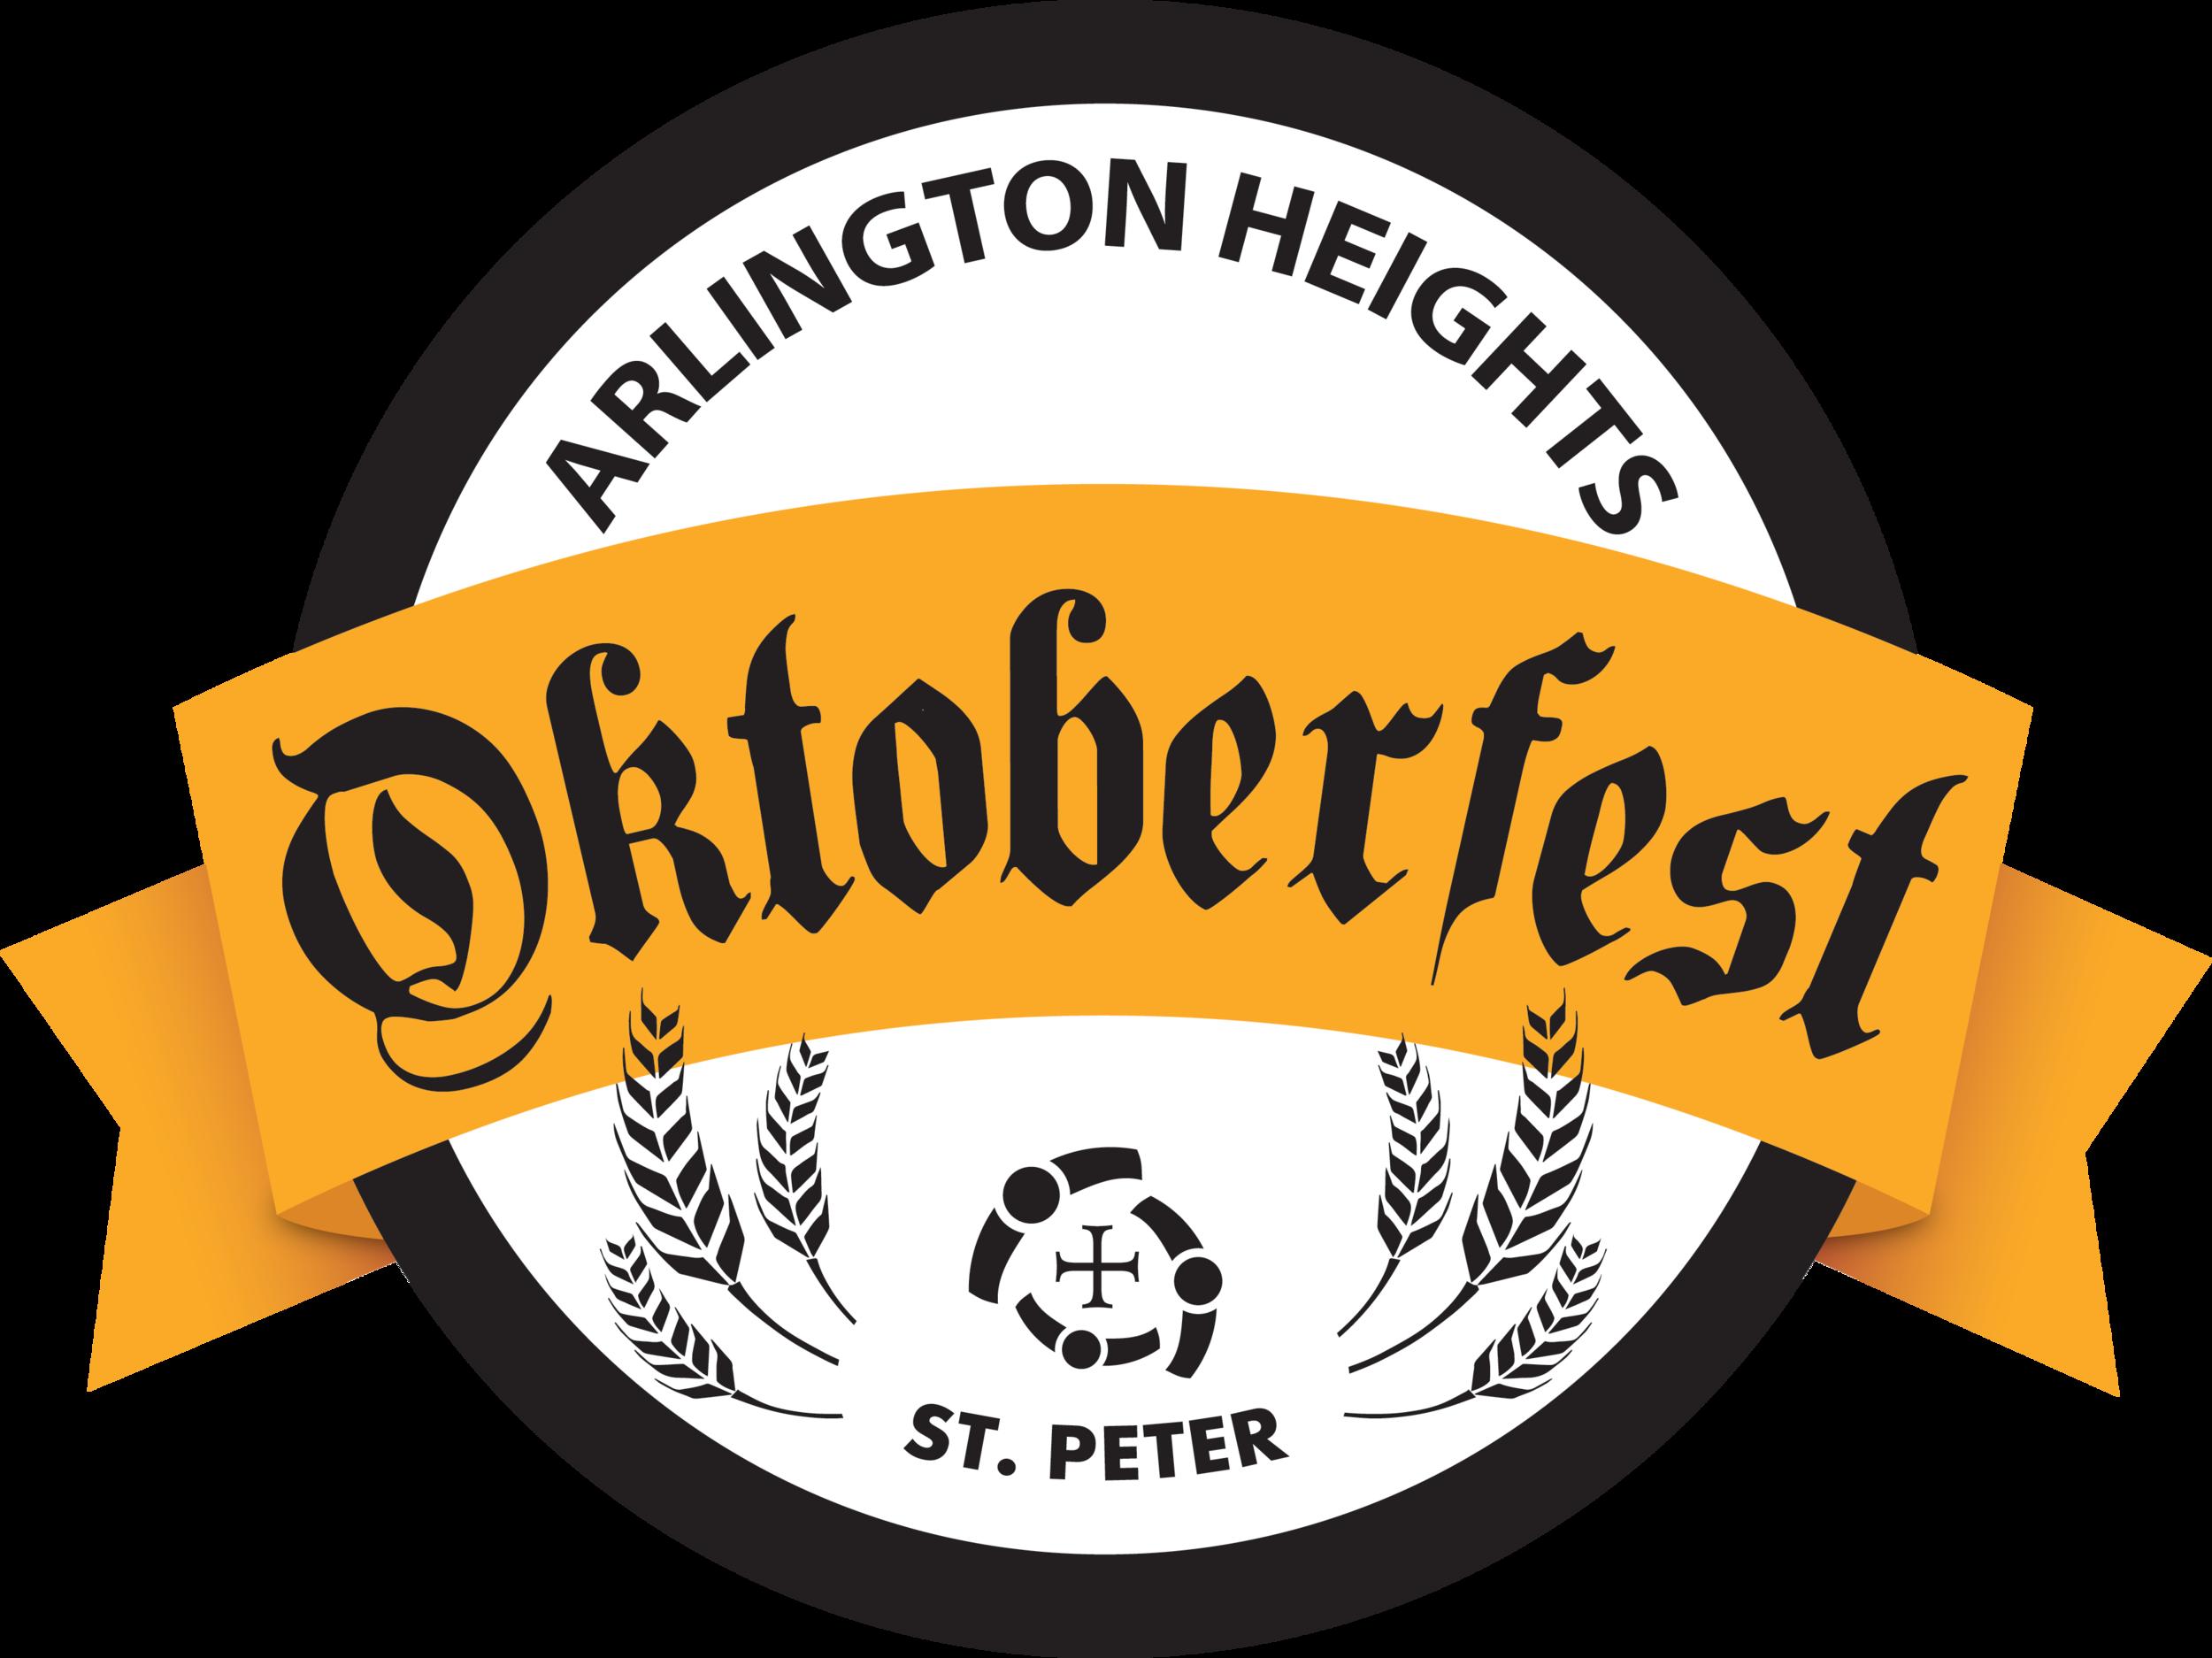 October fest. Arlington Heights Illinois. September 21 2019